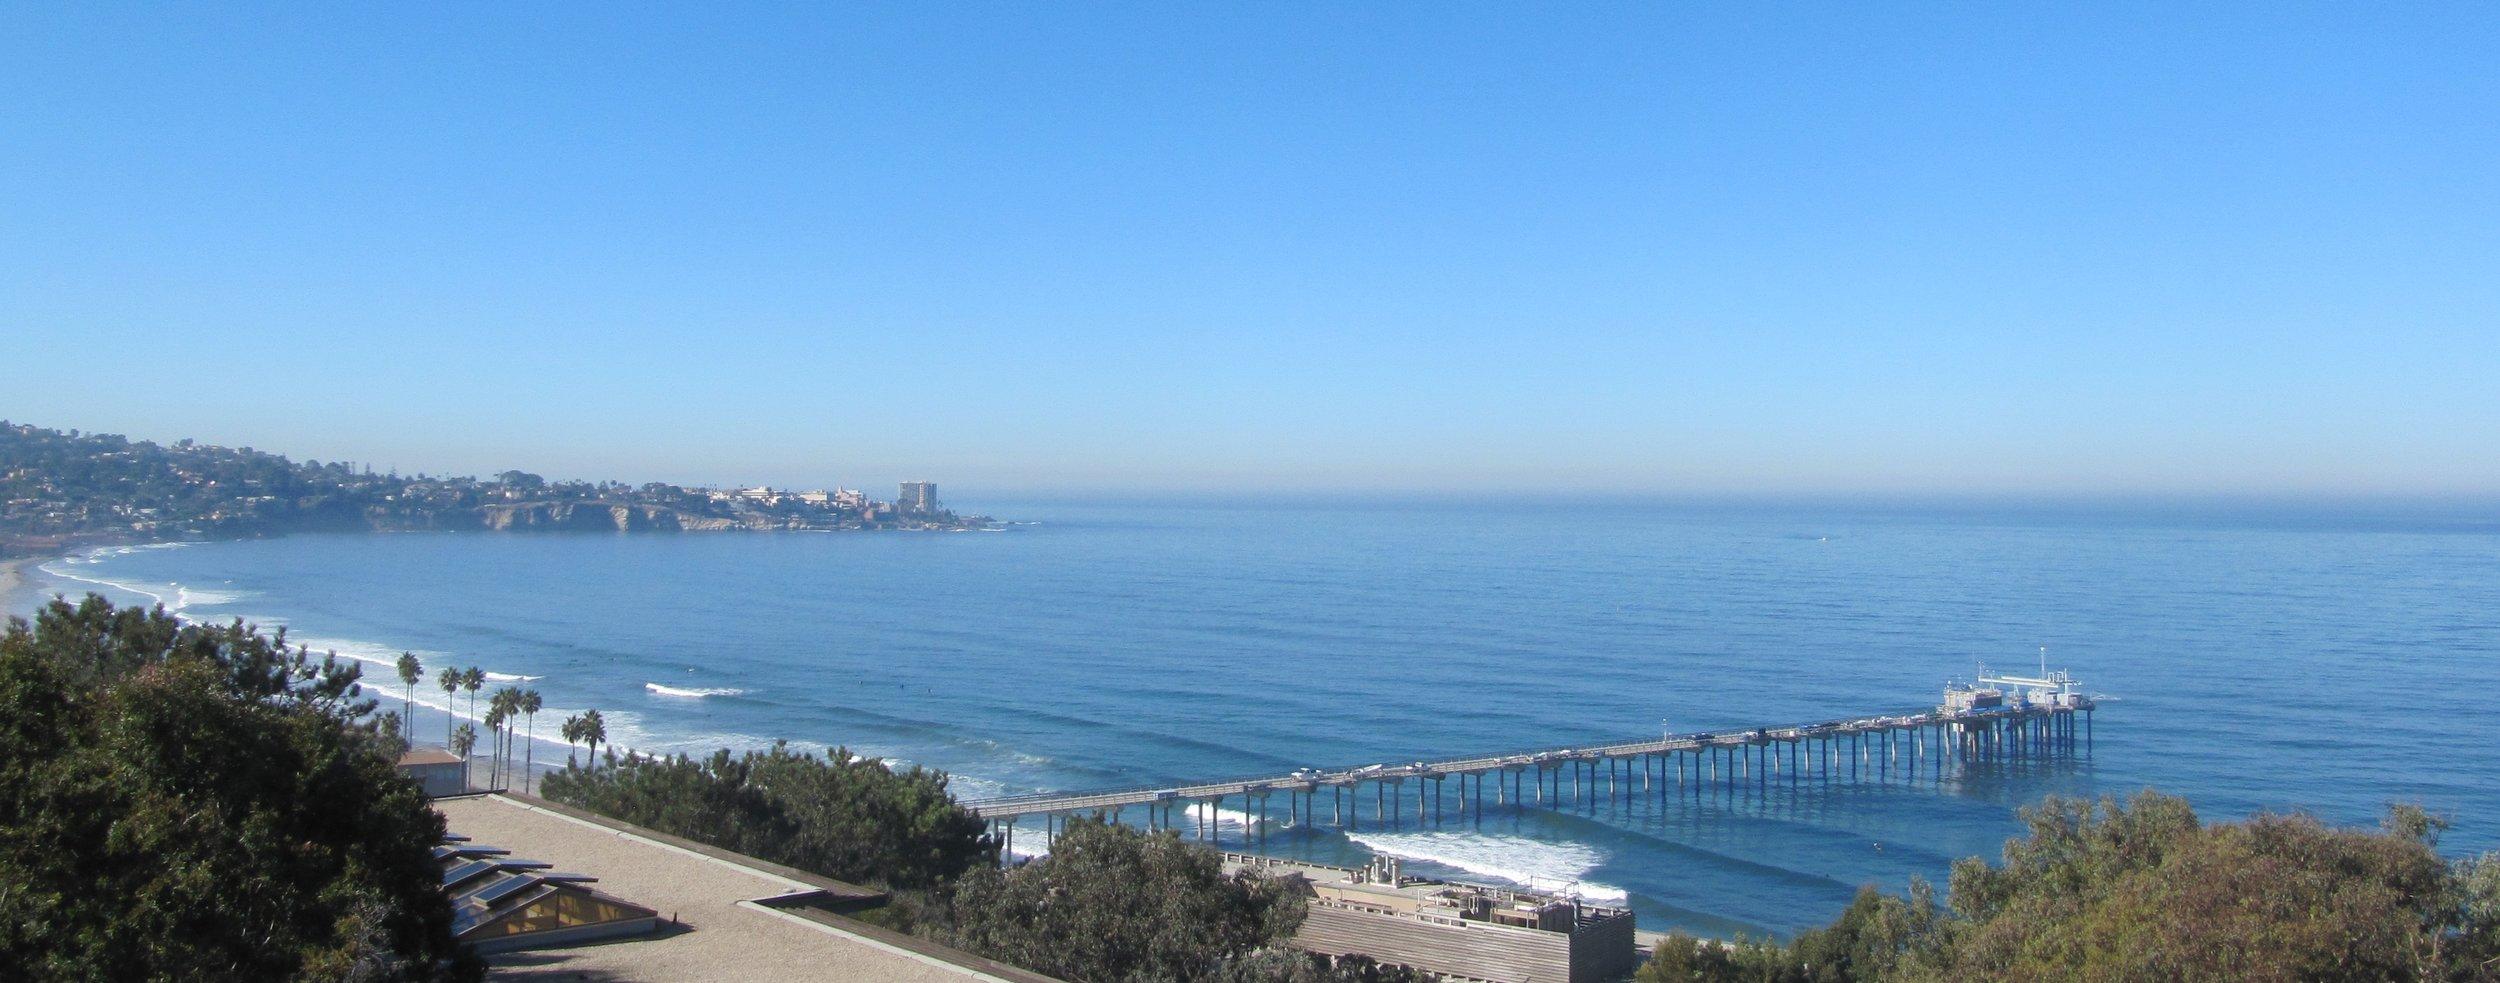 Marine Bio Pier.jpg